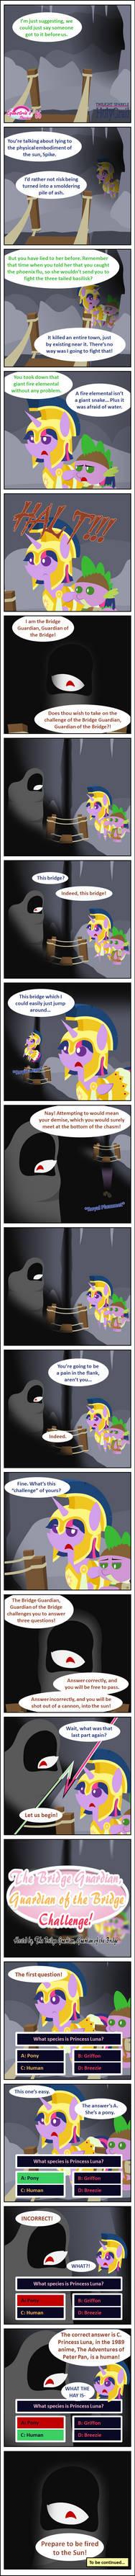 Equestria's Stories - 86